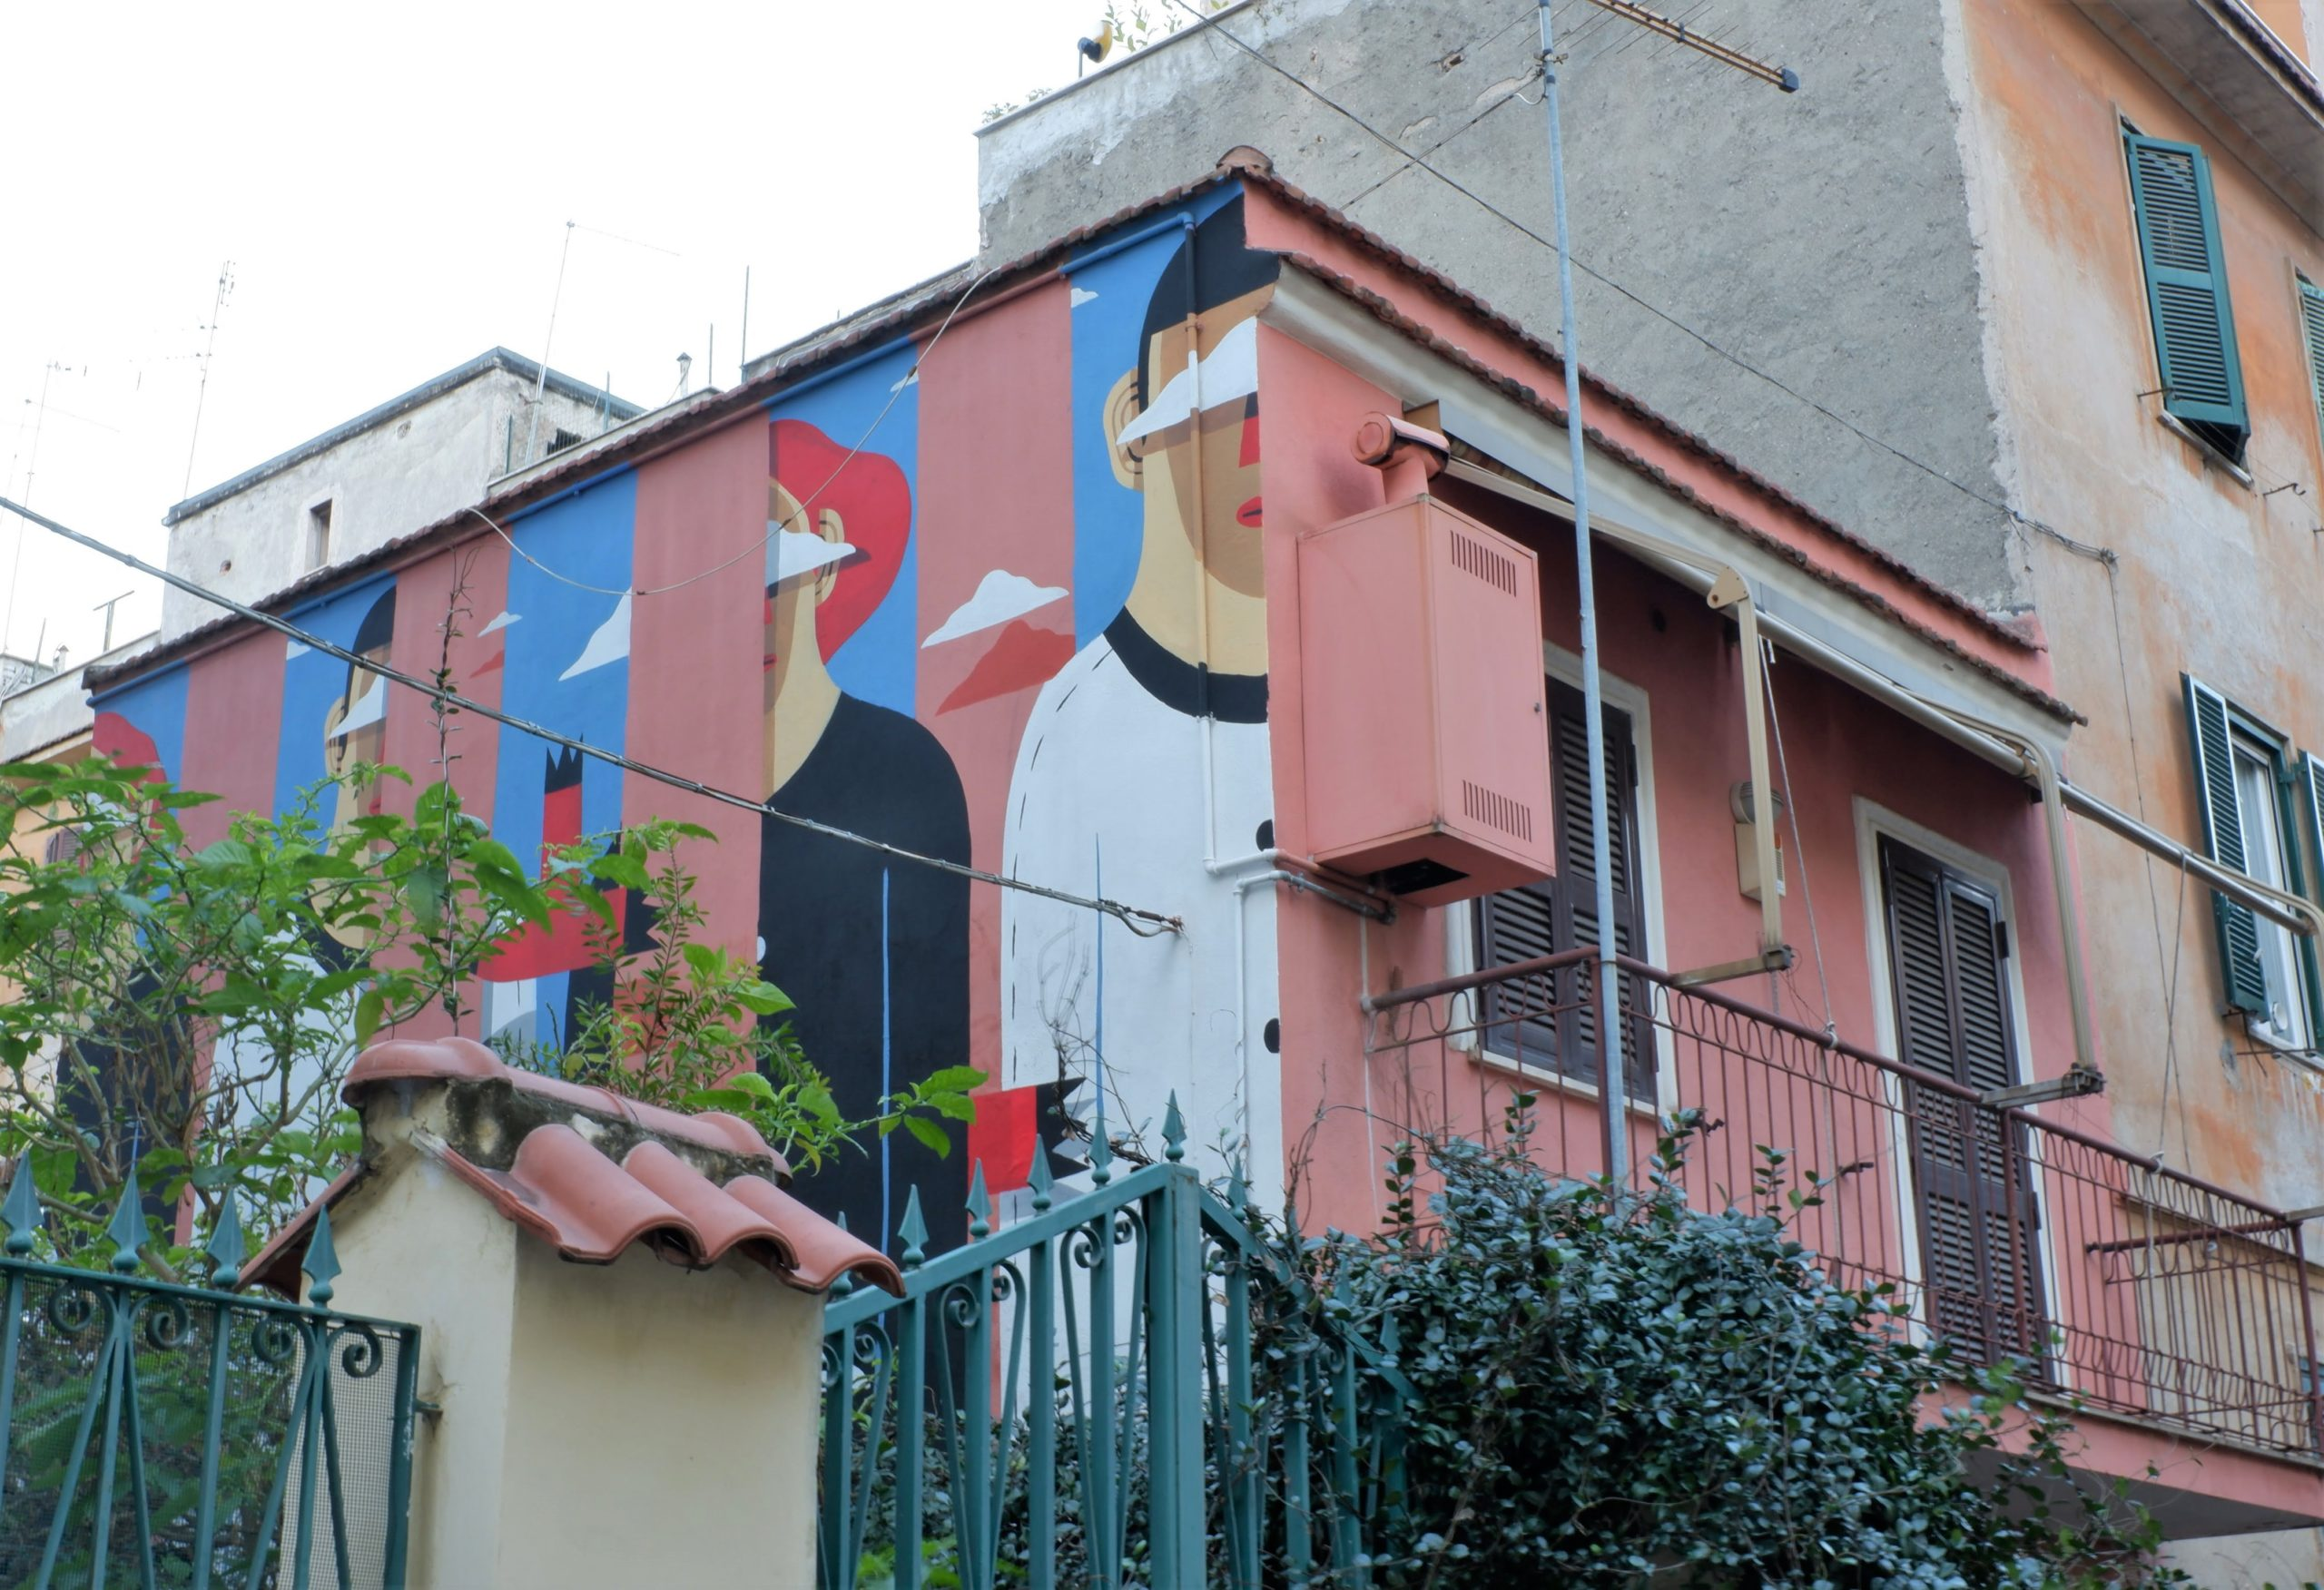 agostino iacurci street art roma tor pignattara